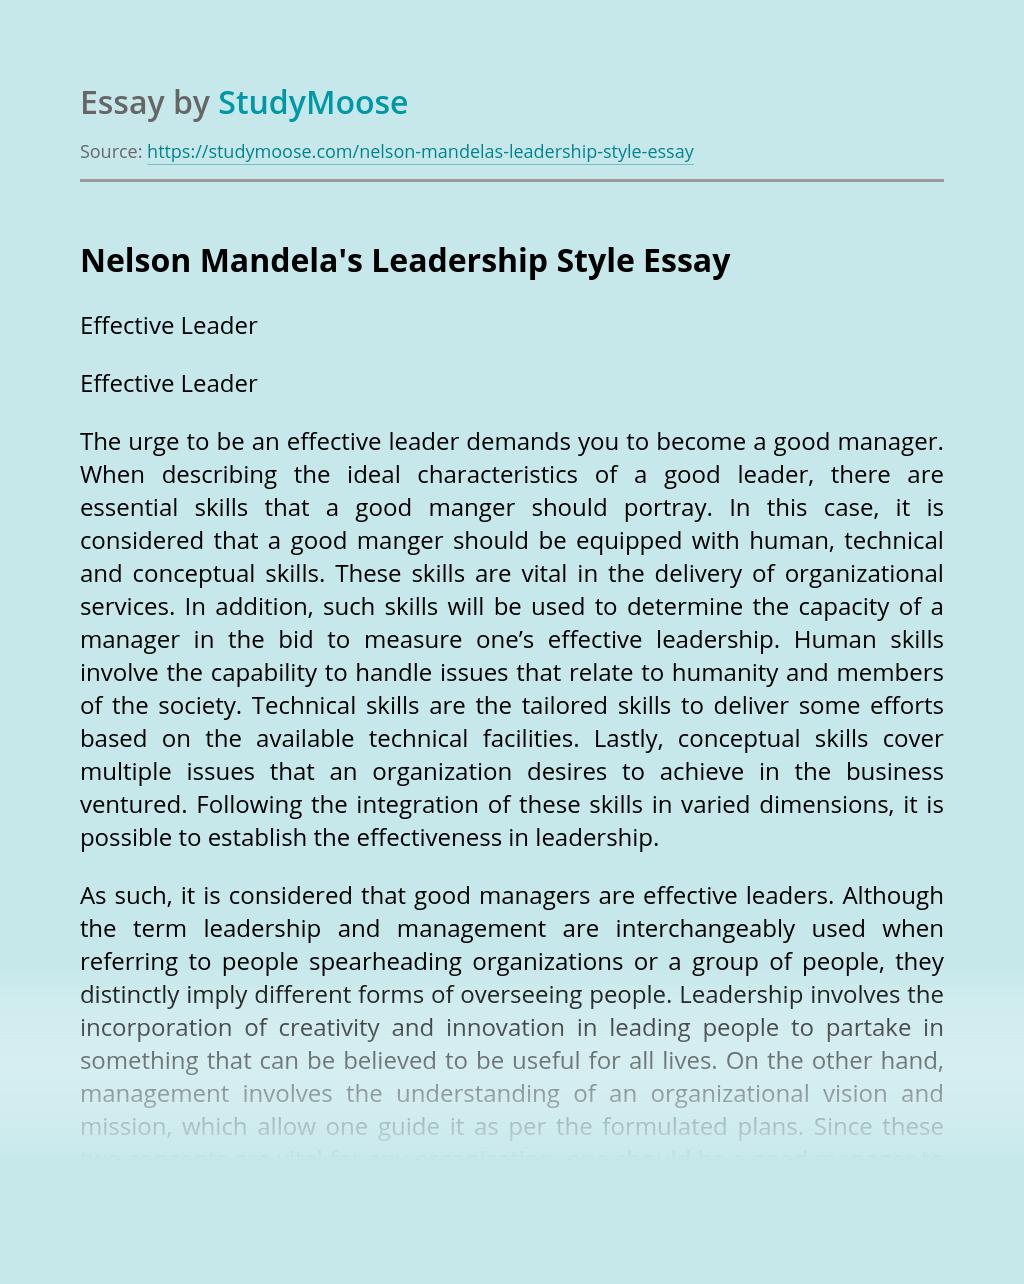 Nelson Mandela's Leadership Style